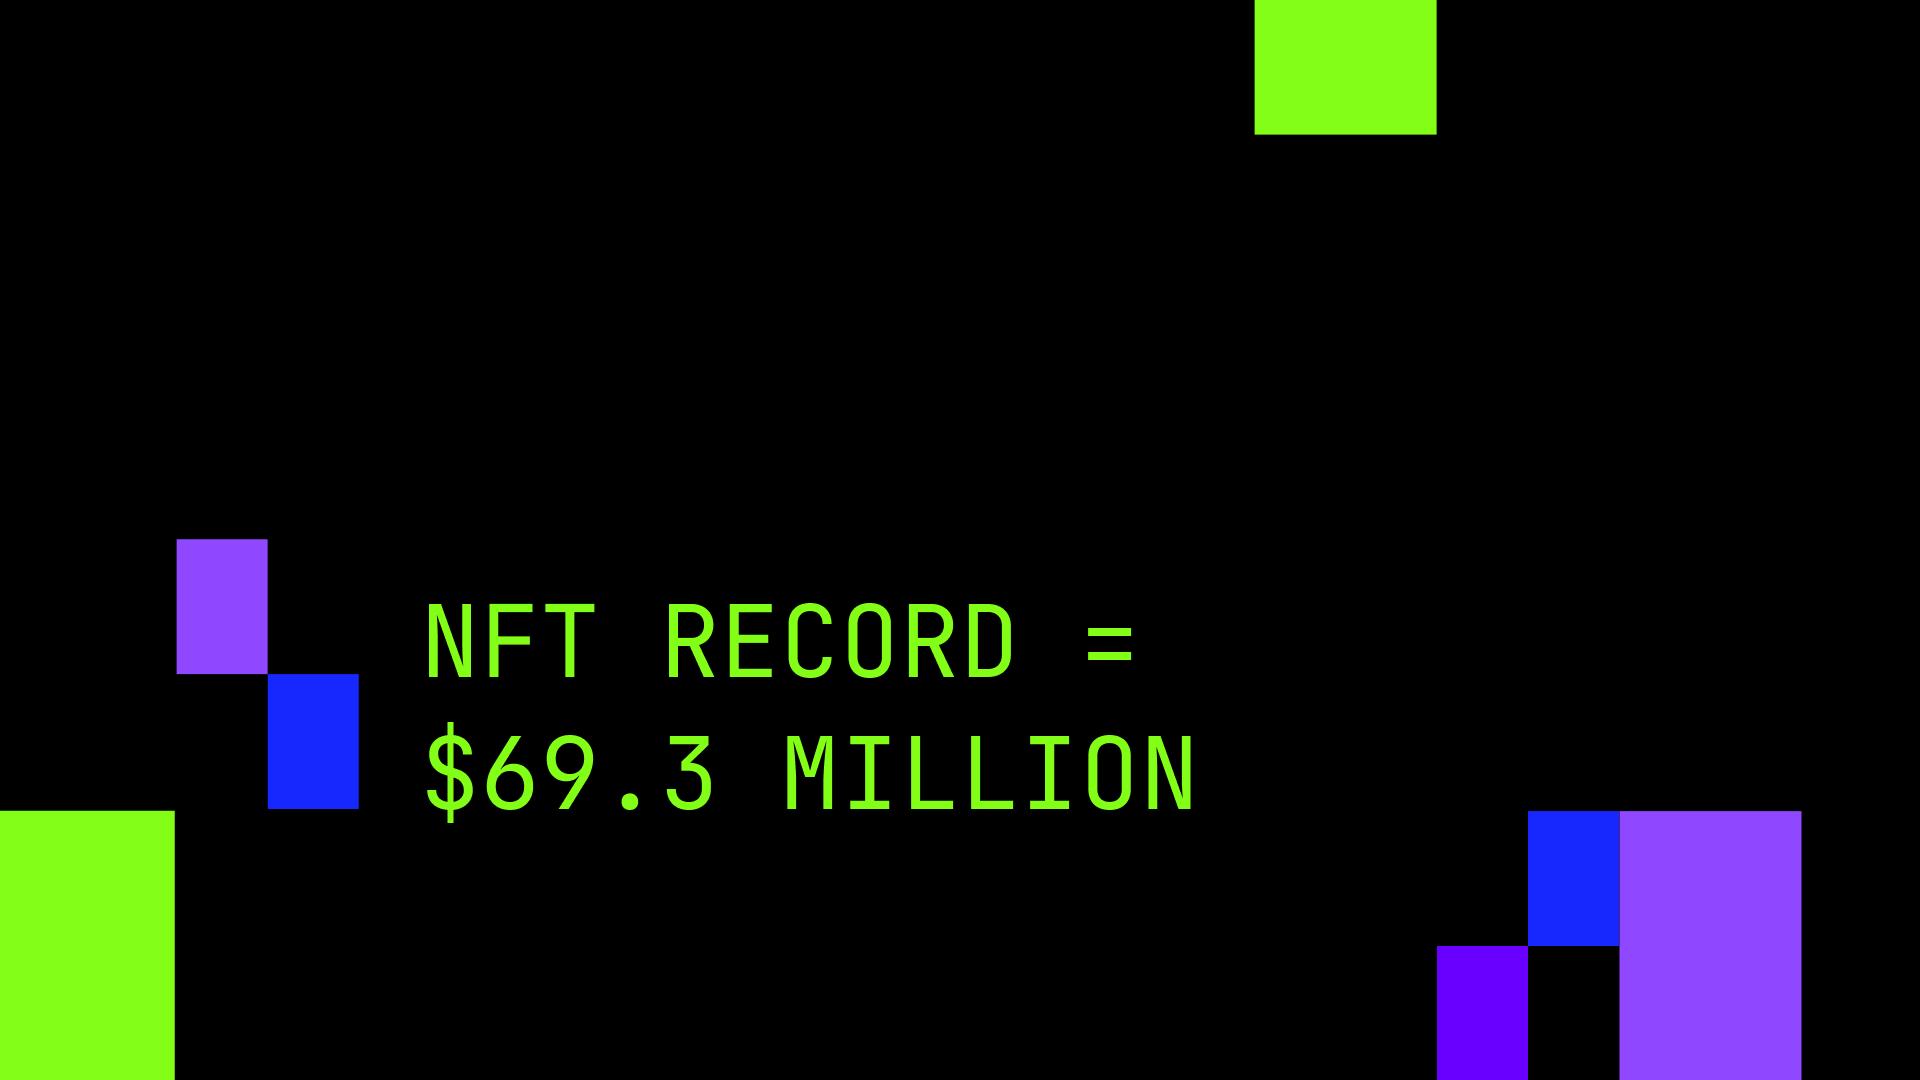 NFT record = $69.3 million